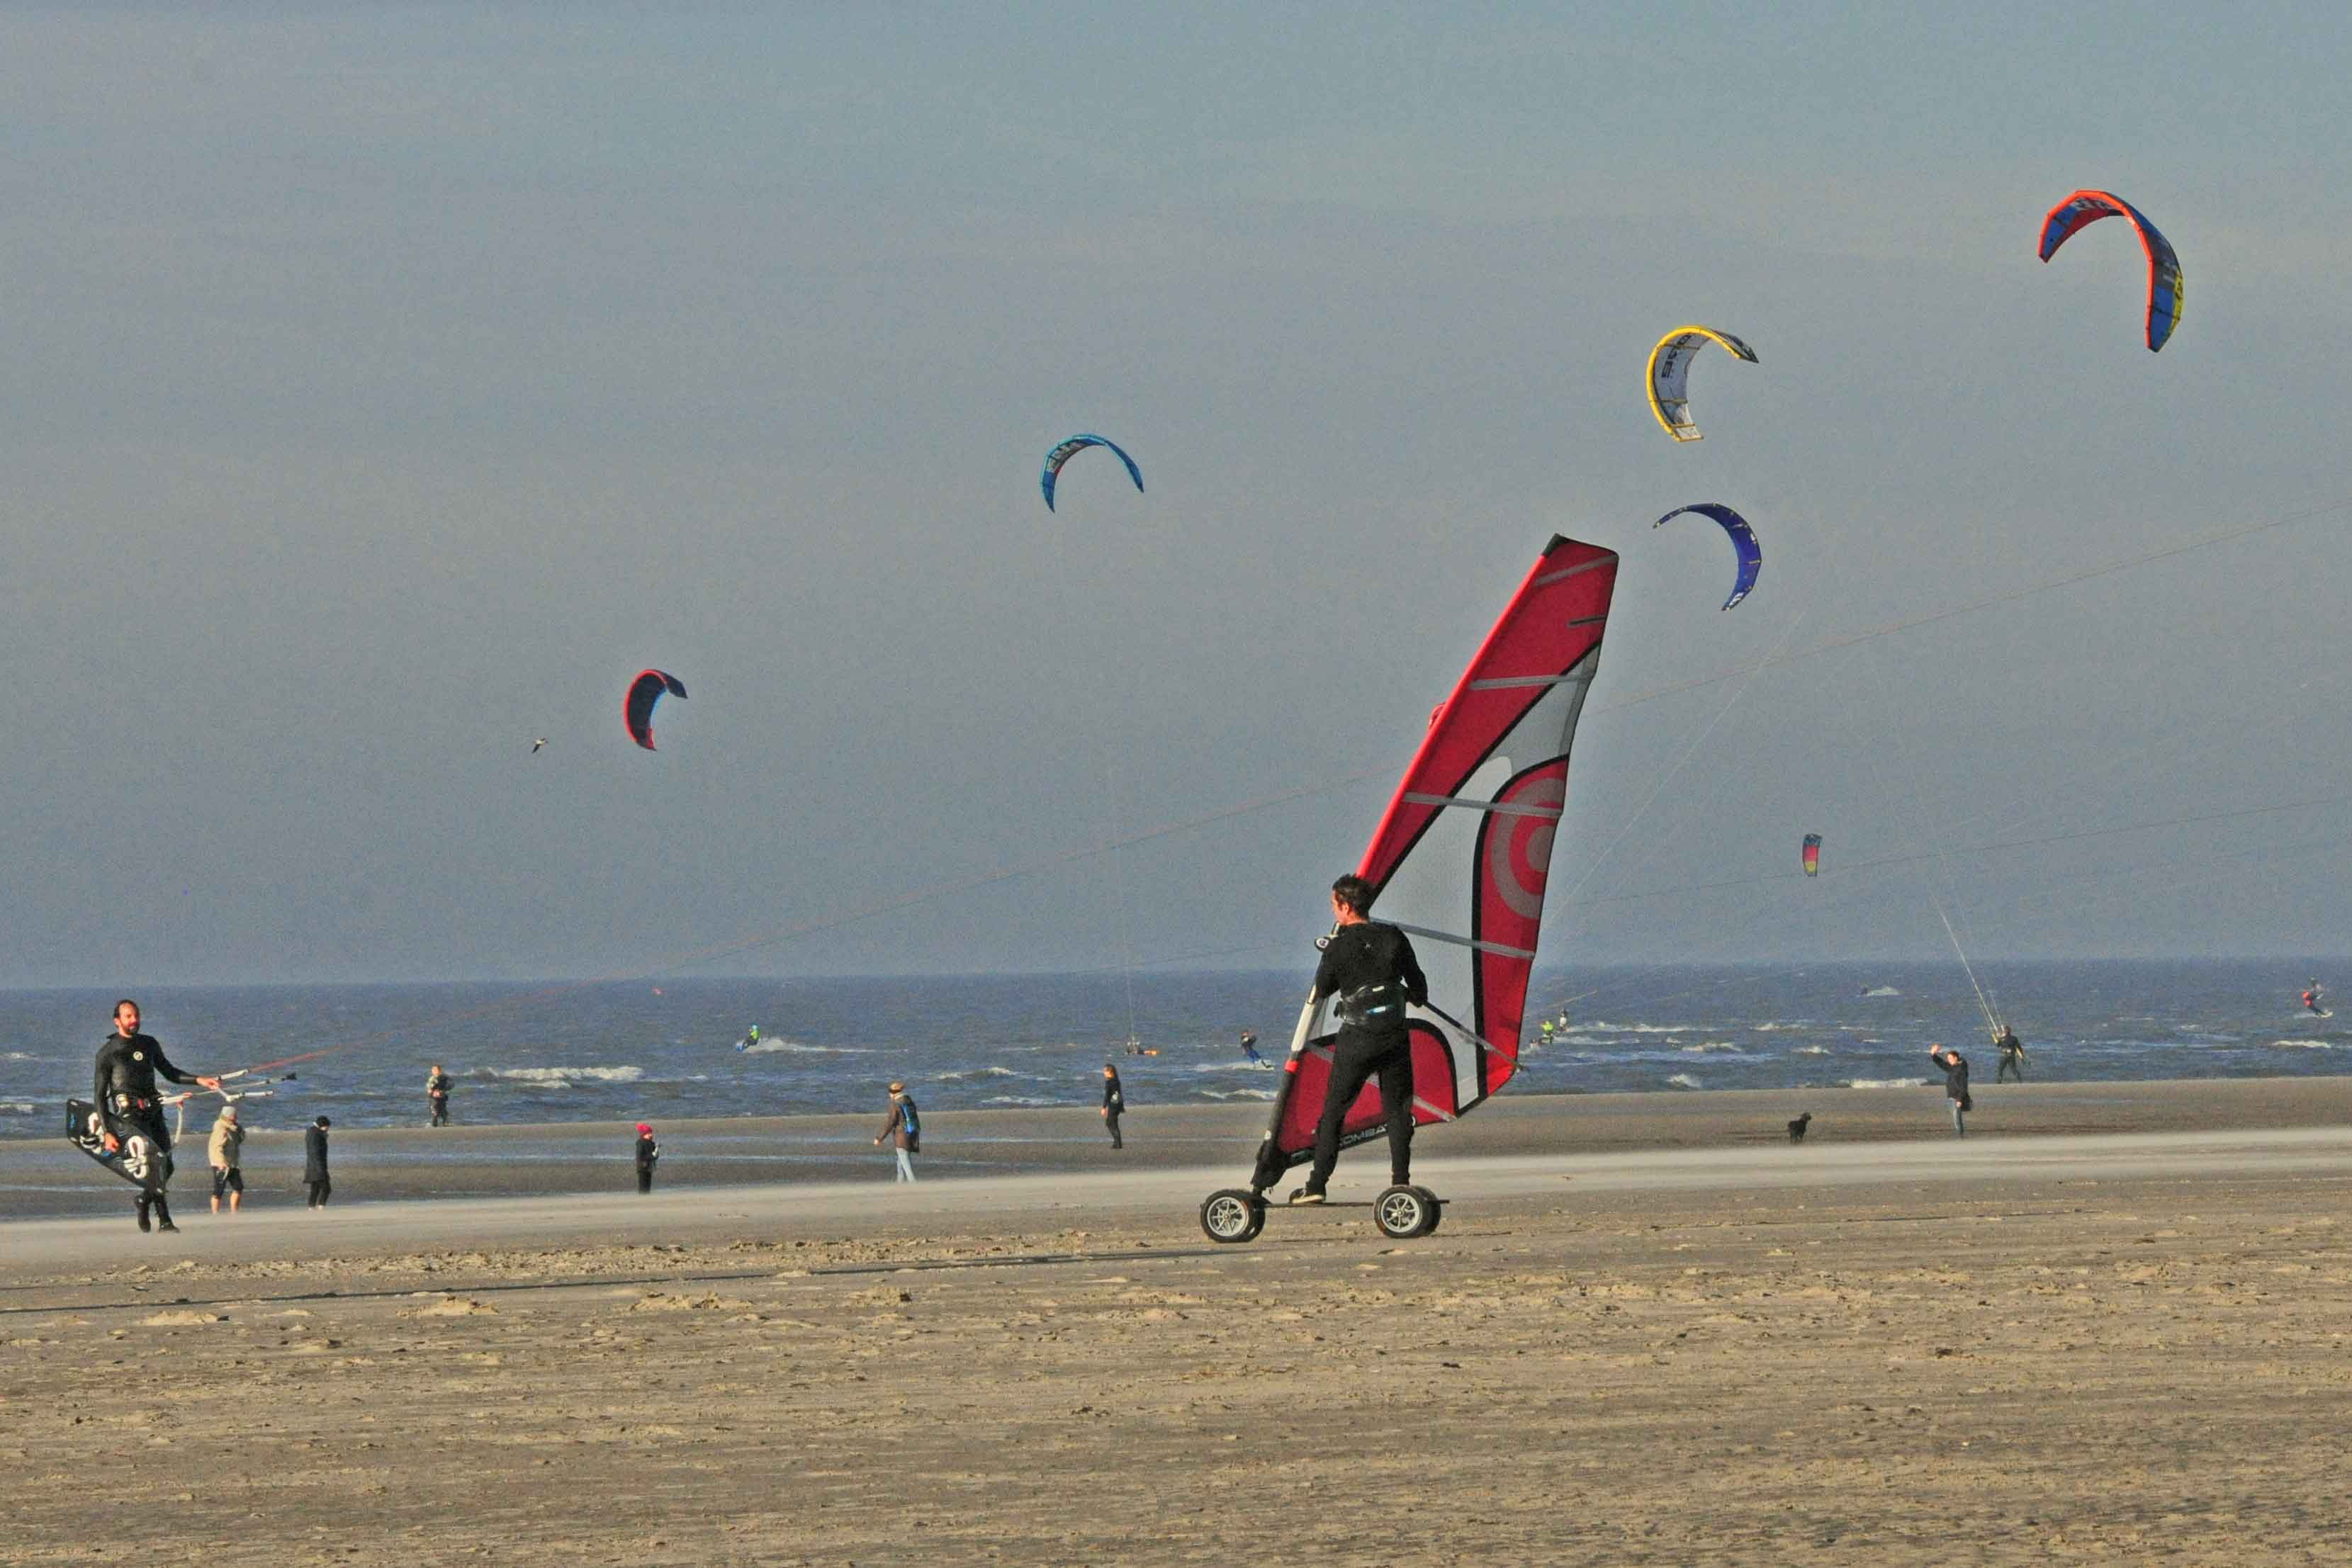 Viel los am Strand: Strandsurfer, Spaziergänger, spielende Kinder. Gut, dass Ebbe war